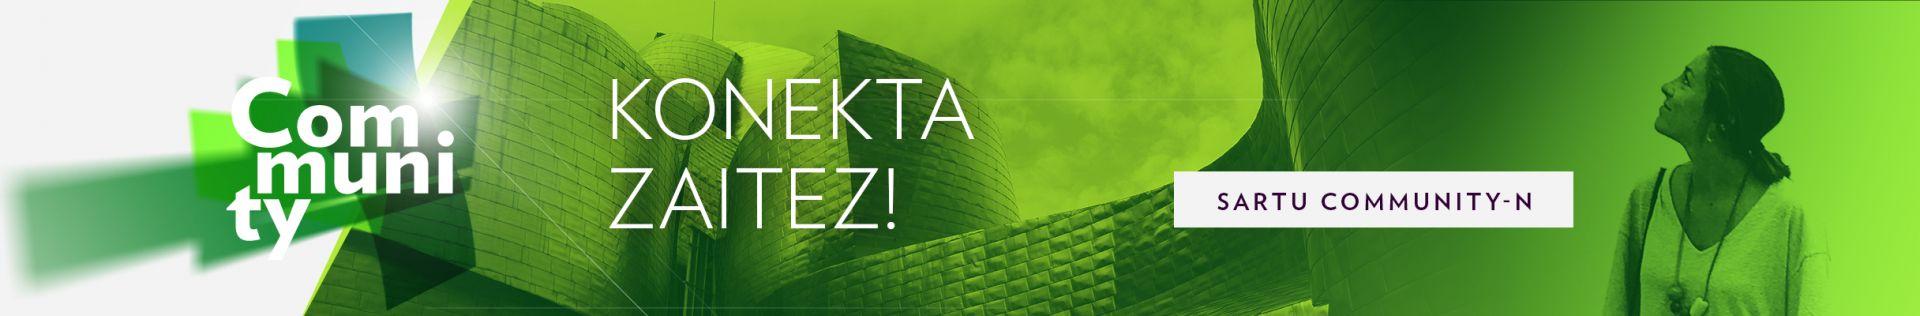 community verde EUS 2432x400